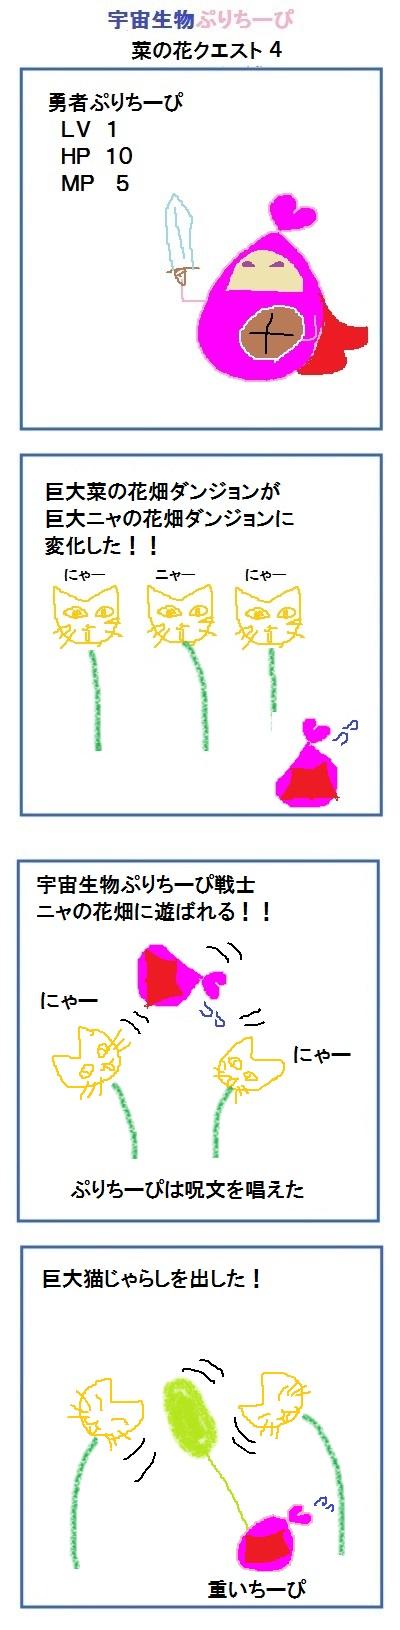 160317_nanohana_quest4.jpg